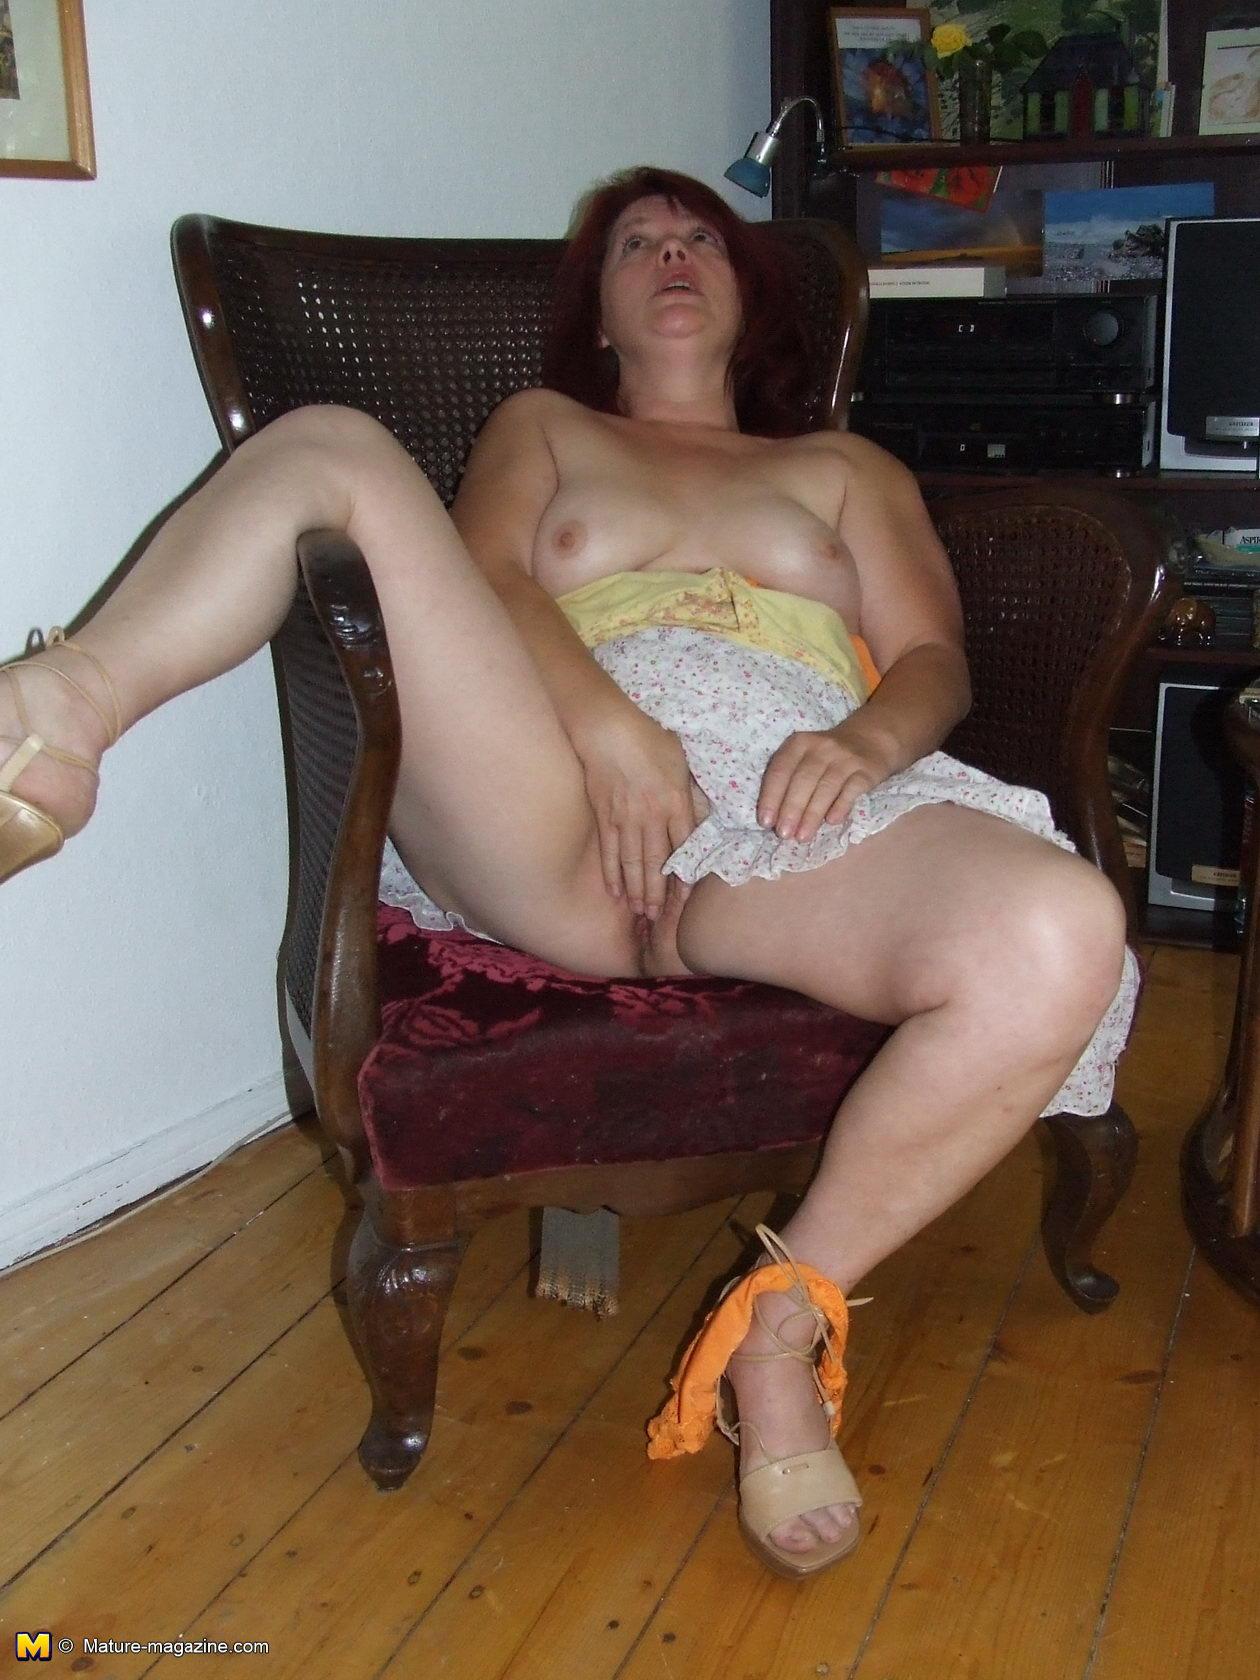 nude model interracial pussy